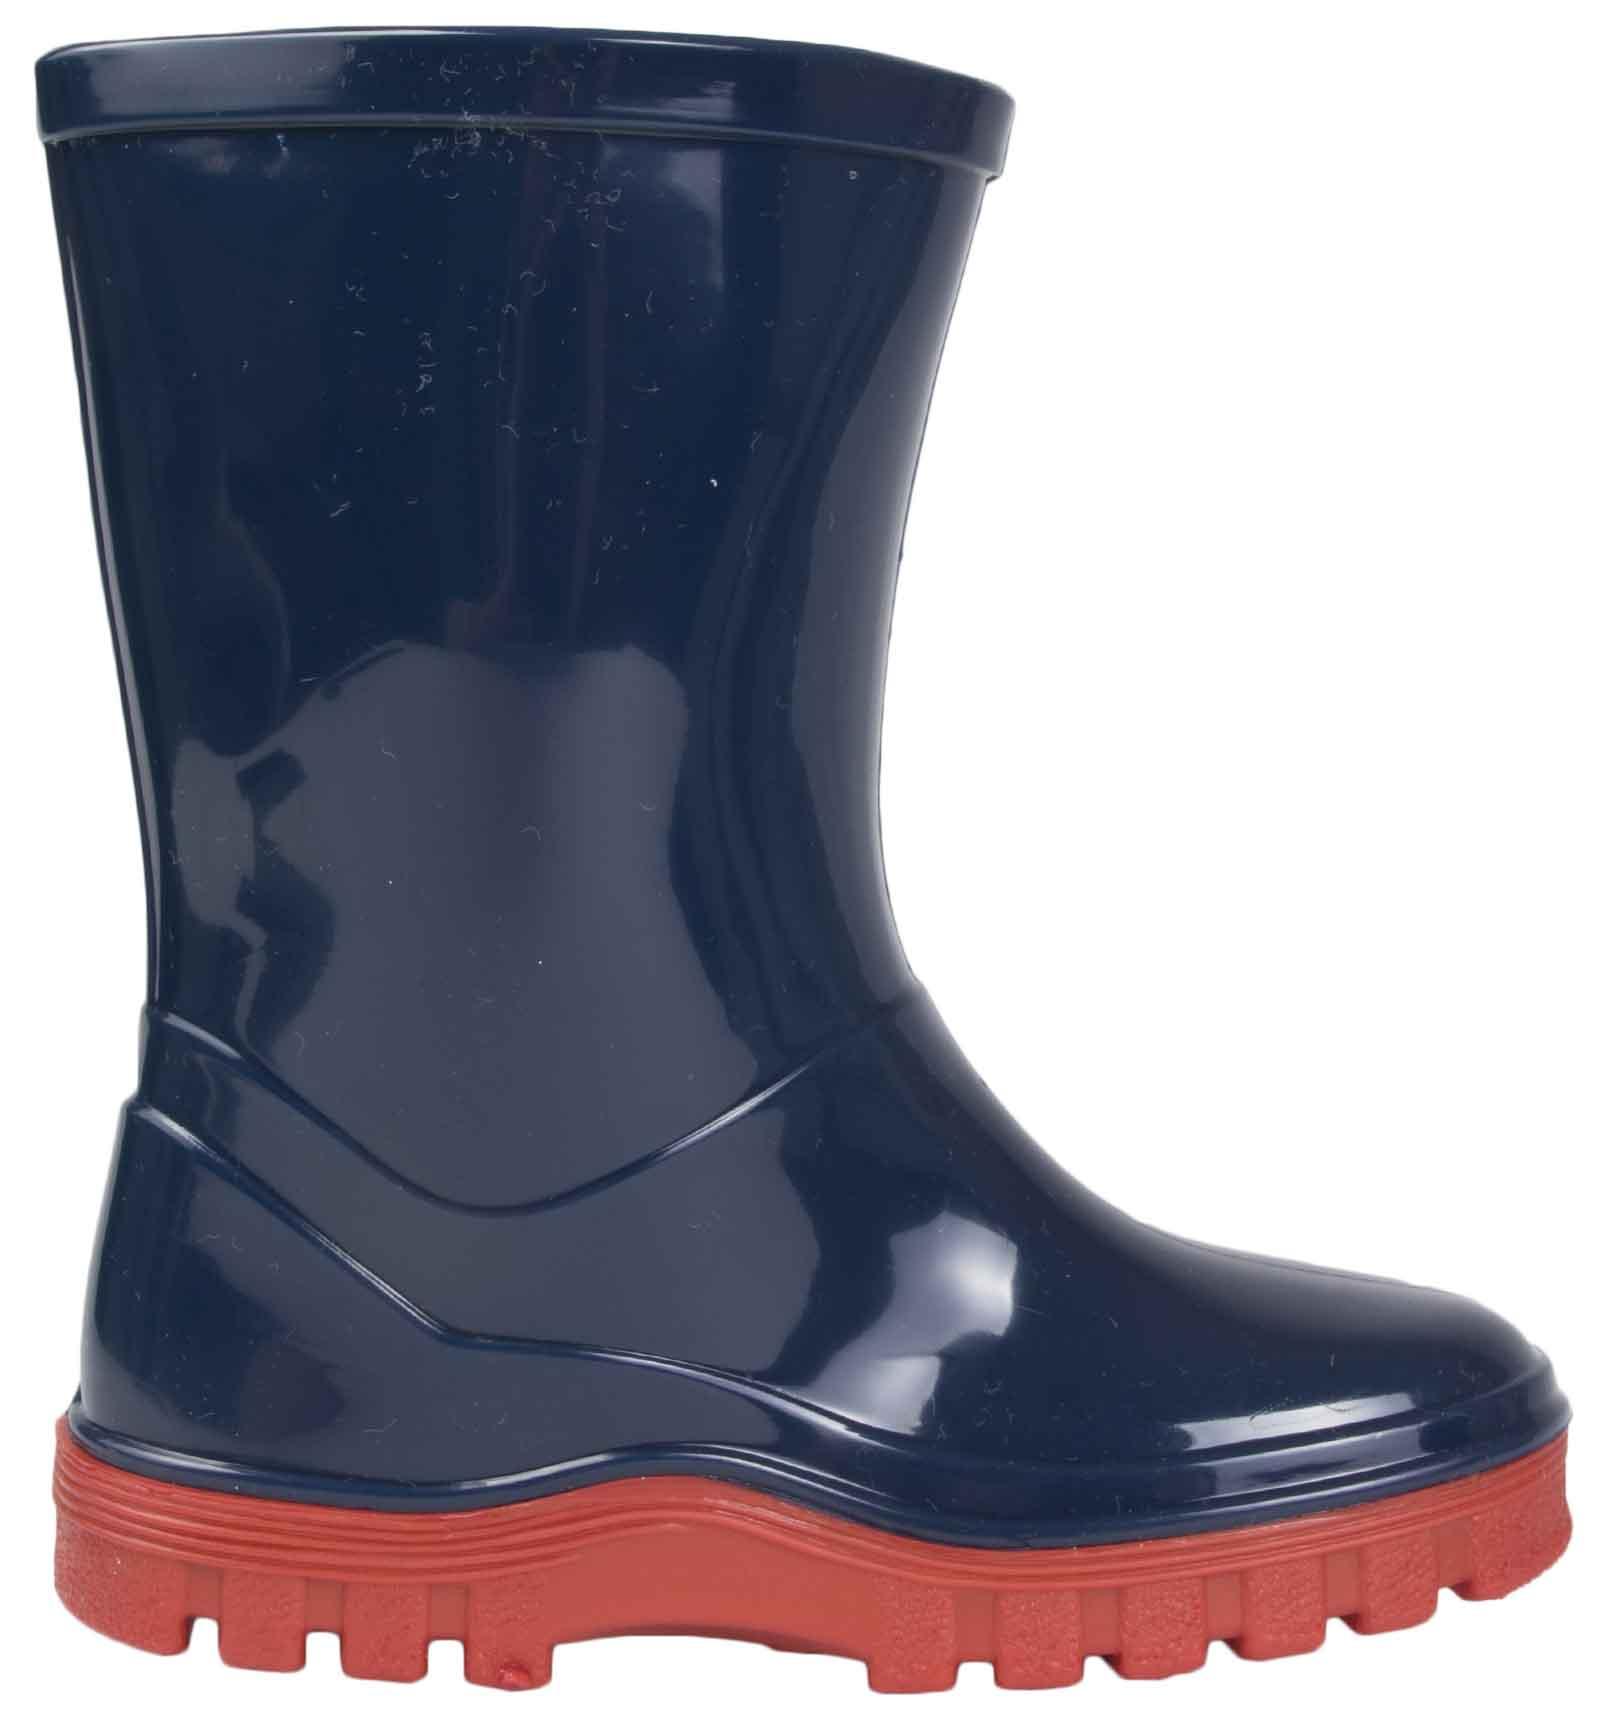 Boys Paw Patrol Wellington Boots Blue Rain Wellies Mid Calf Snow Boots Kids Size